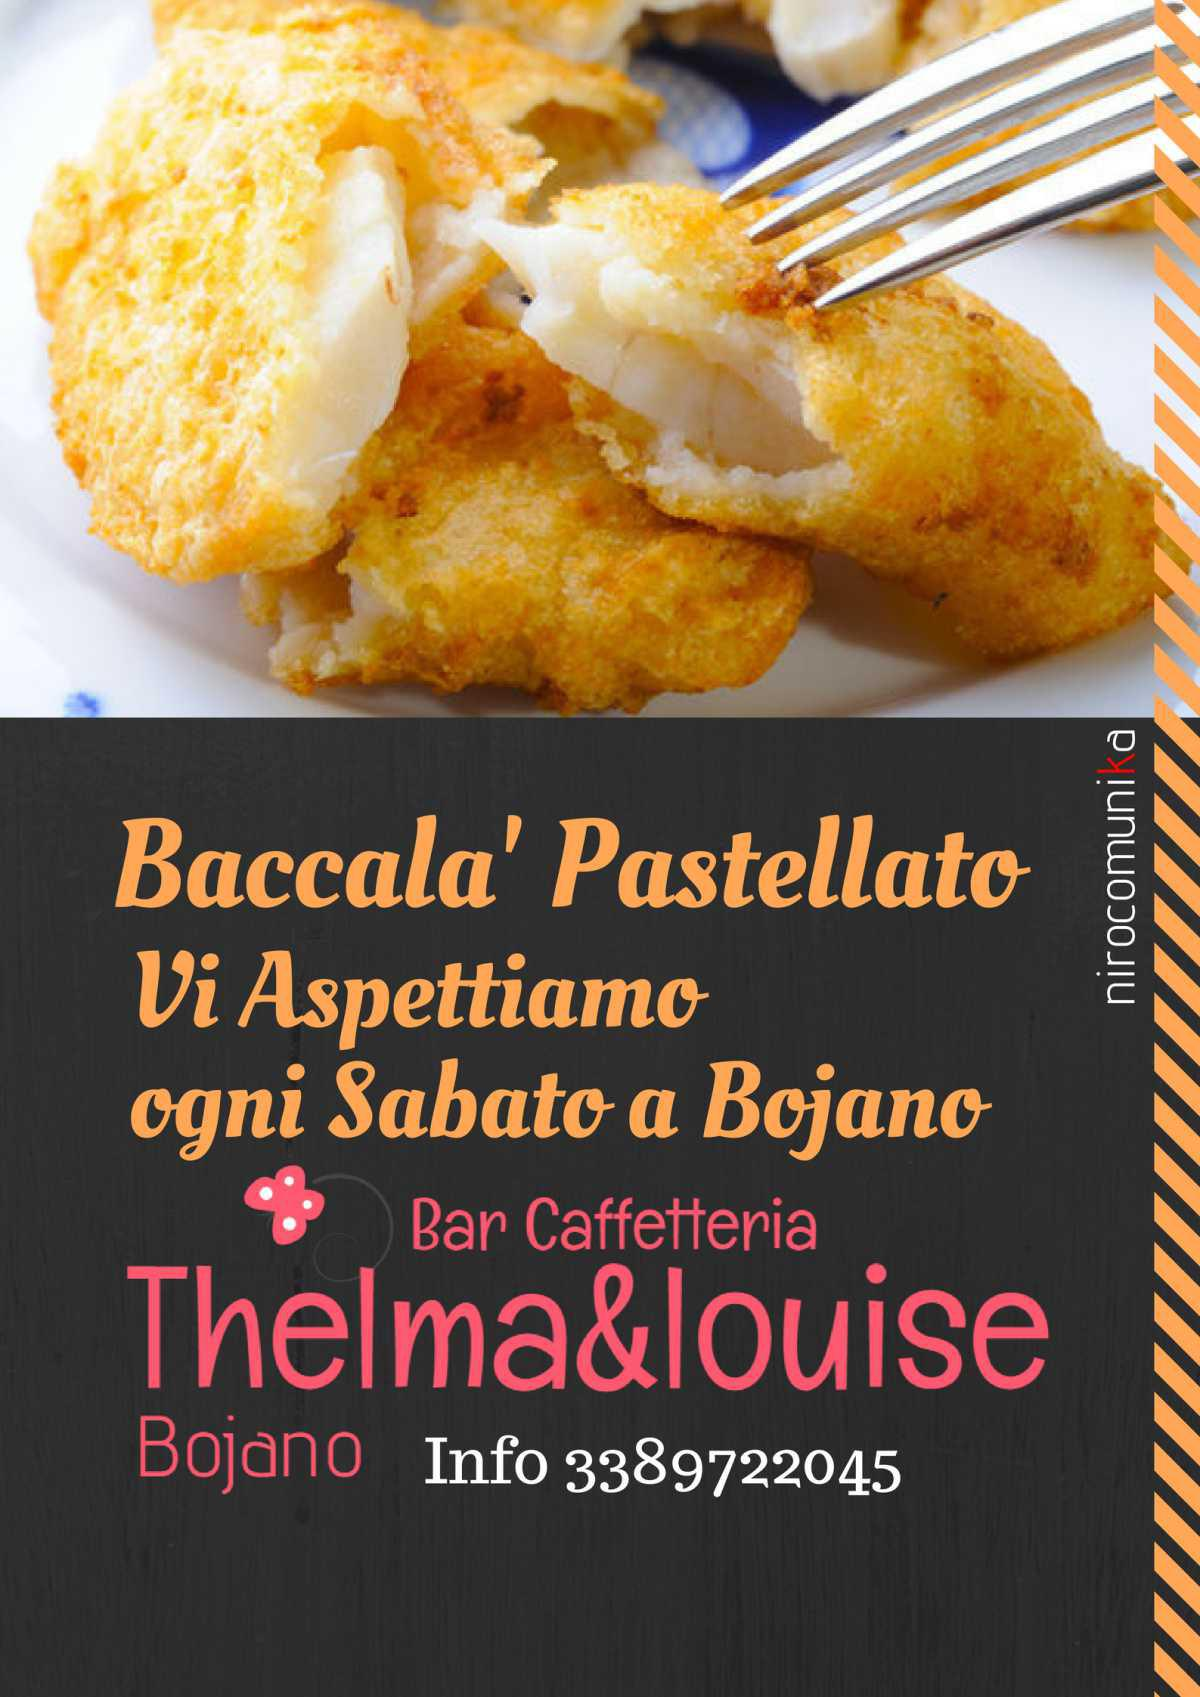 Bar Caffetteria Paninoteca Thelma&louise